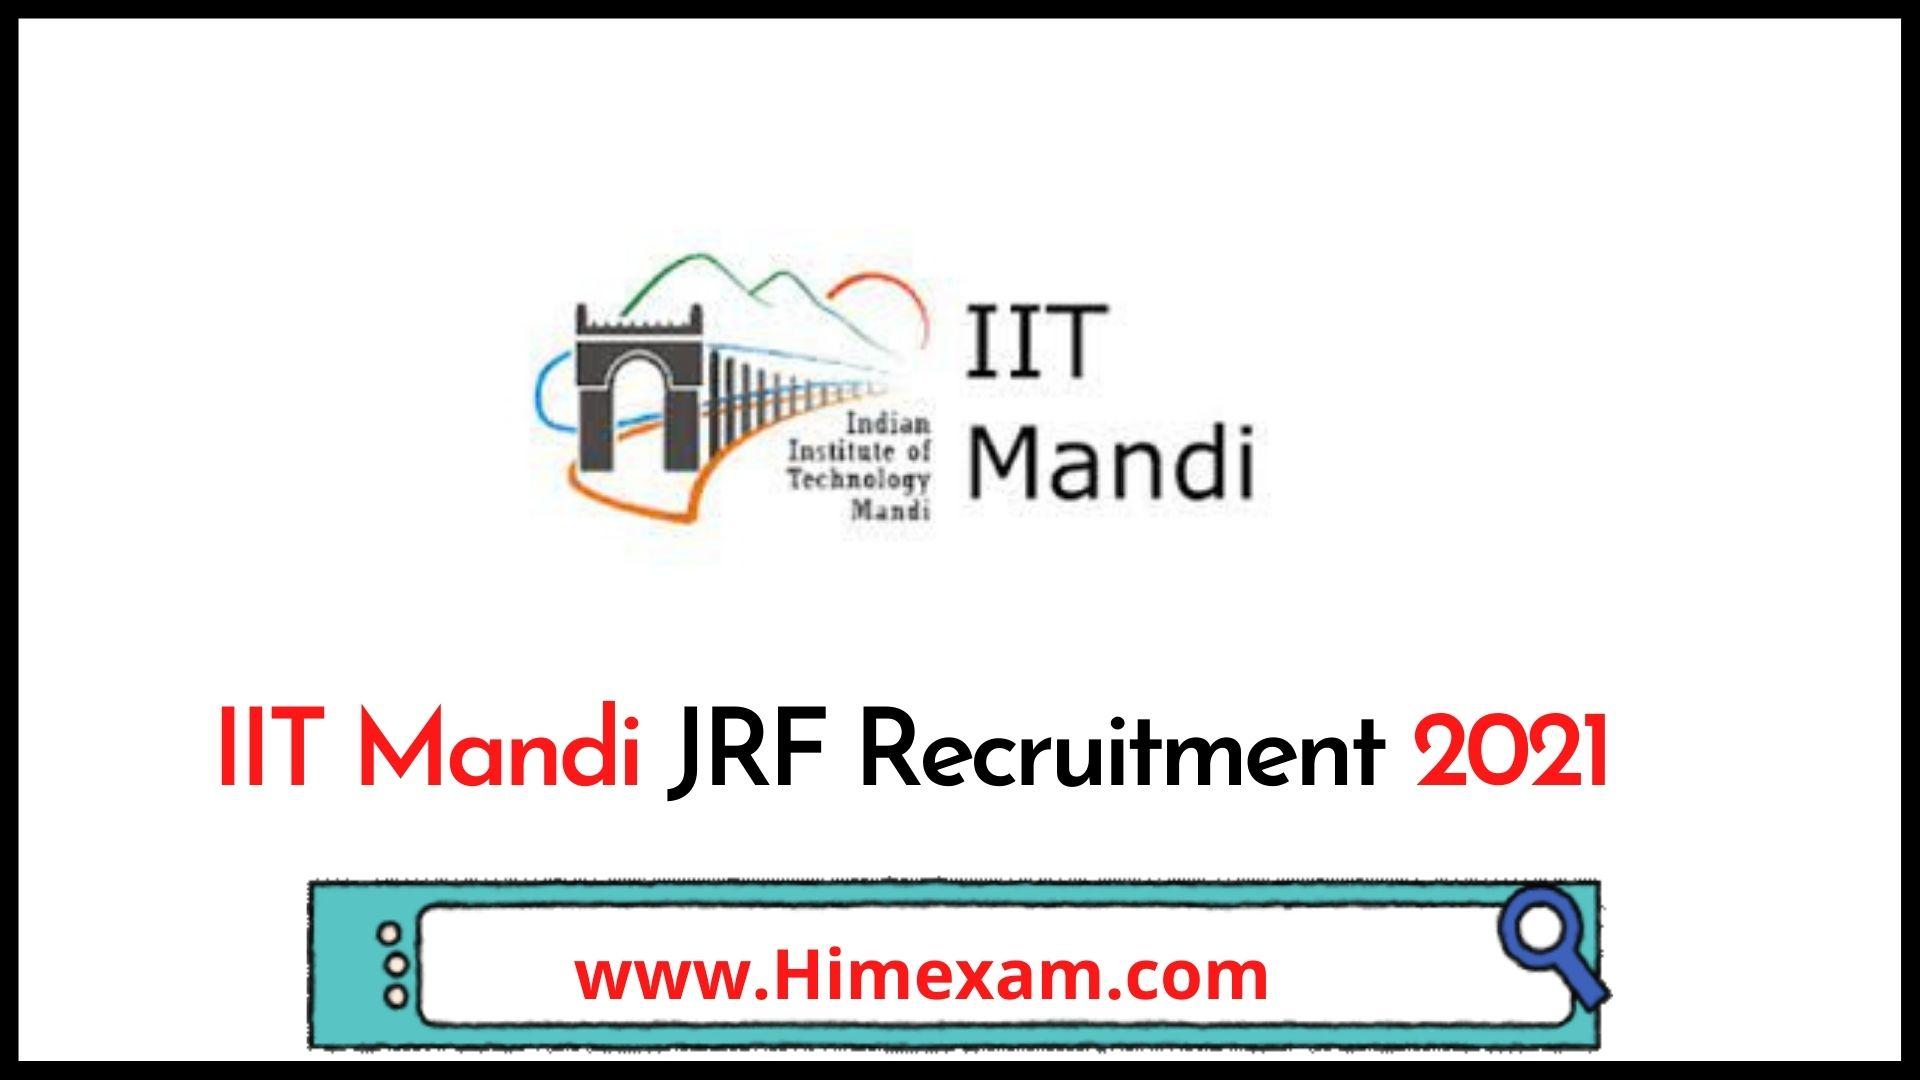 IIT Mandi JRF Recruitment  2021